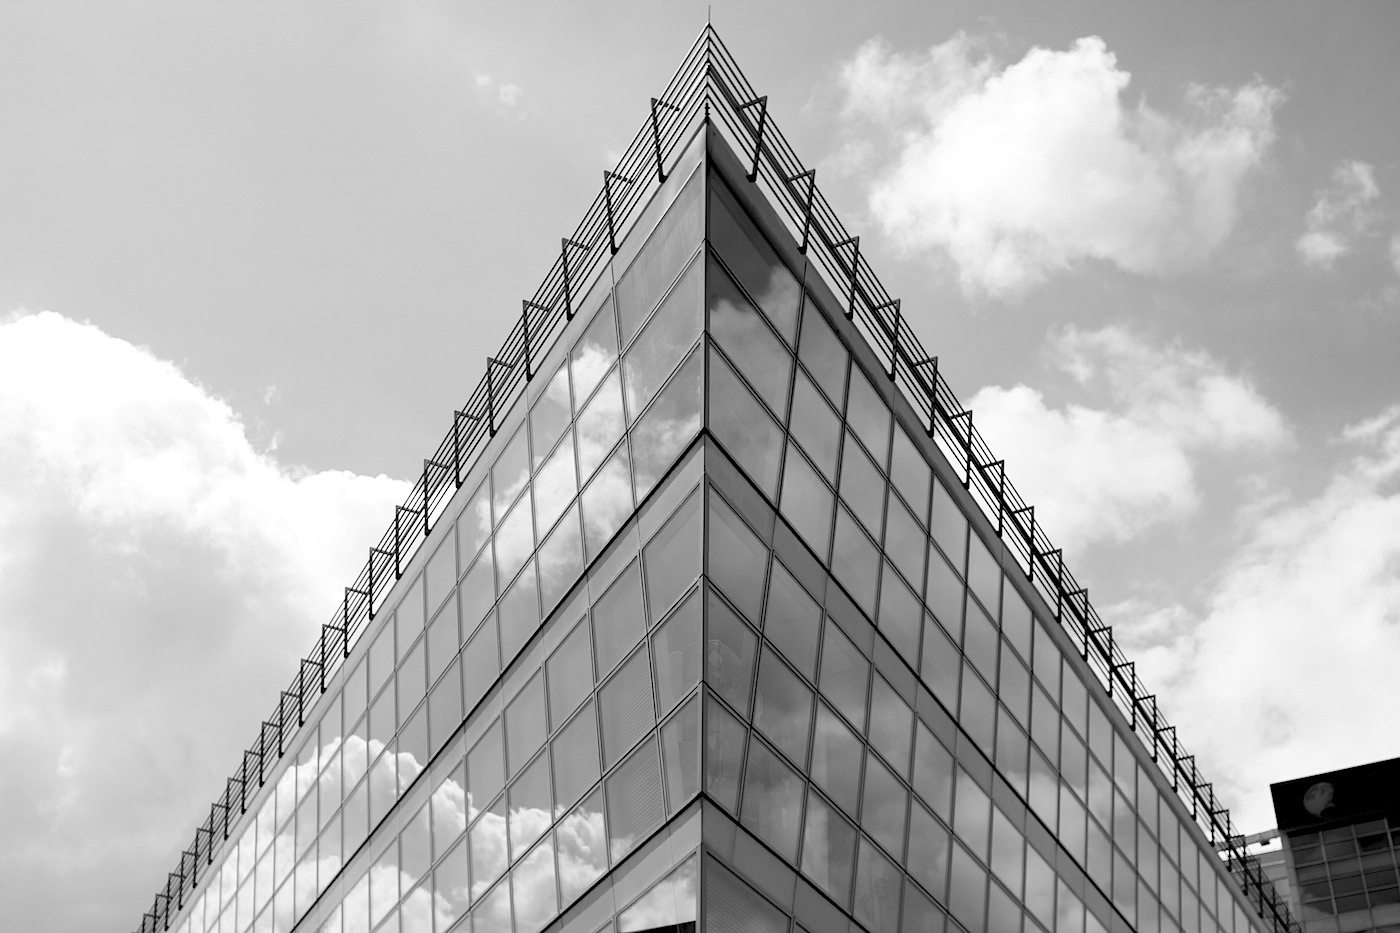 Kai Center.  By Döring Dahmen Joeressen. Completion: 1996.